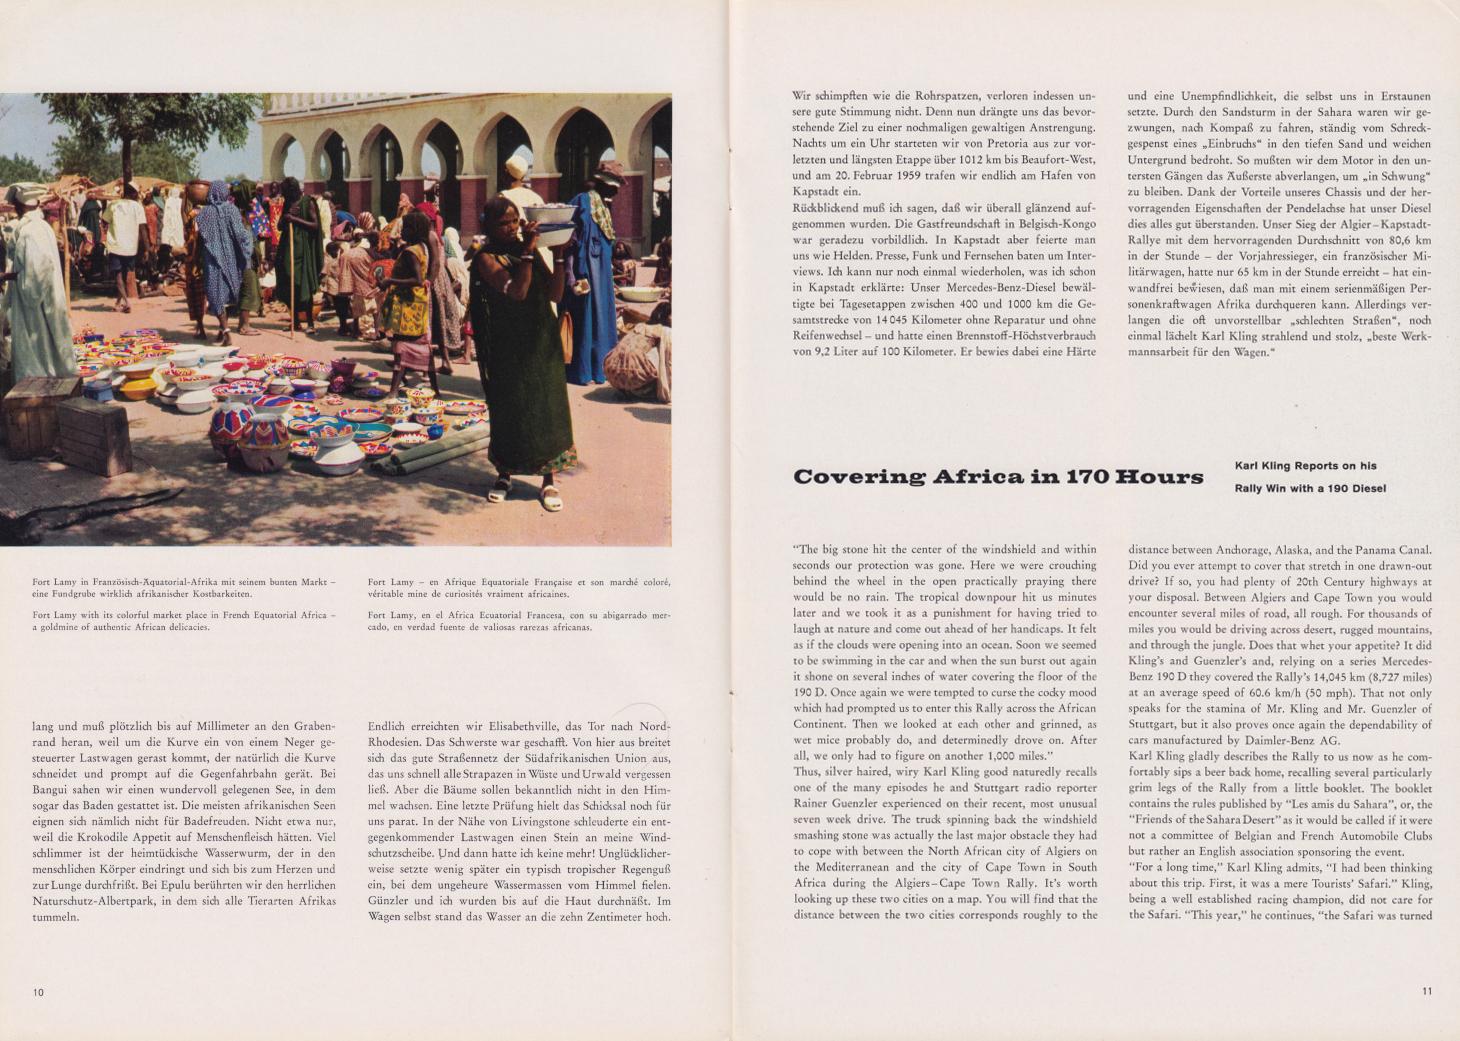 (REVISTA): Periódico In aller welt n.º 31 - Mercedes-Benz no mundo - 1959 - multilingue 006